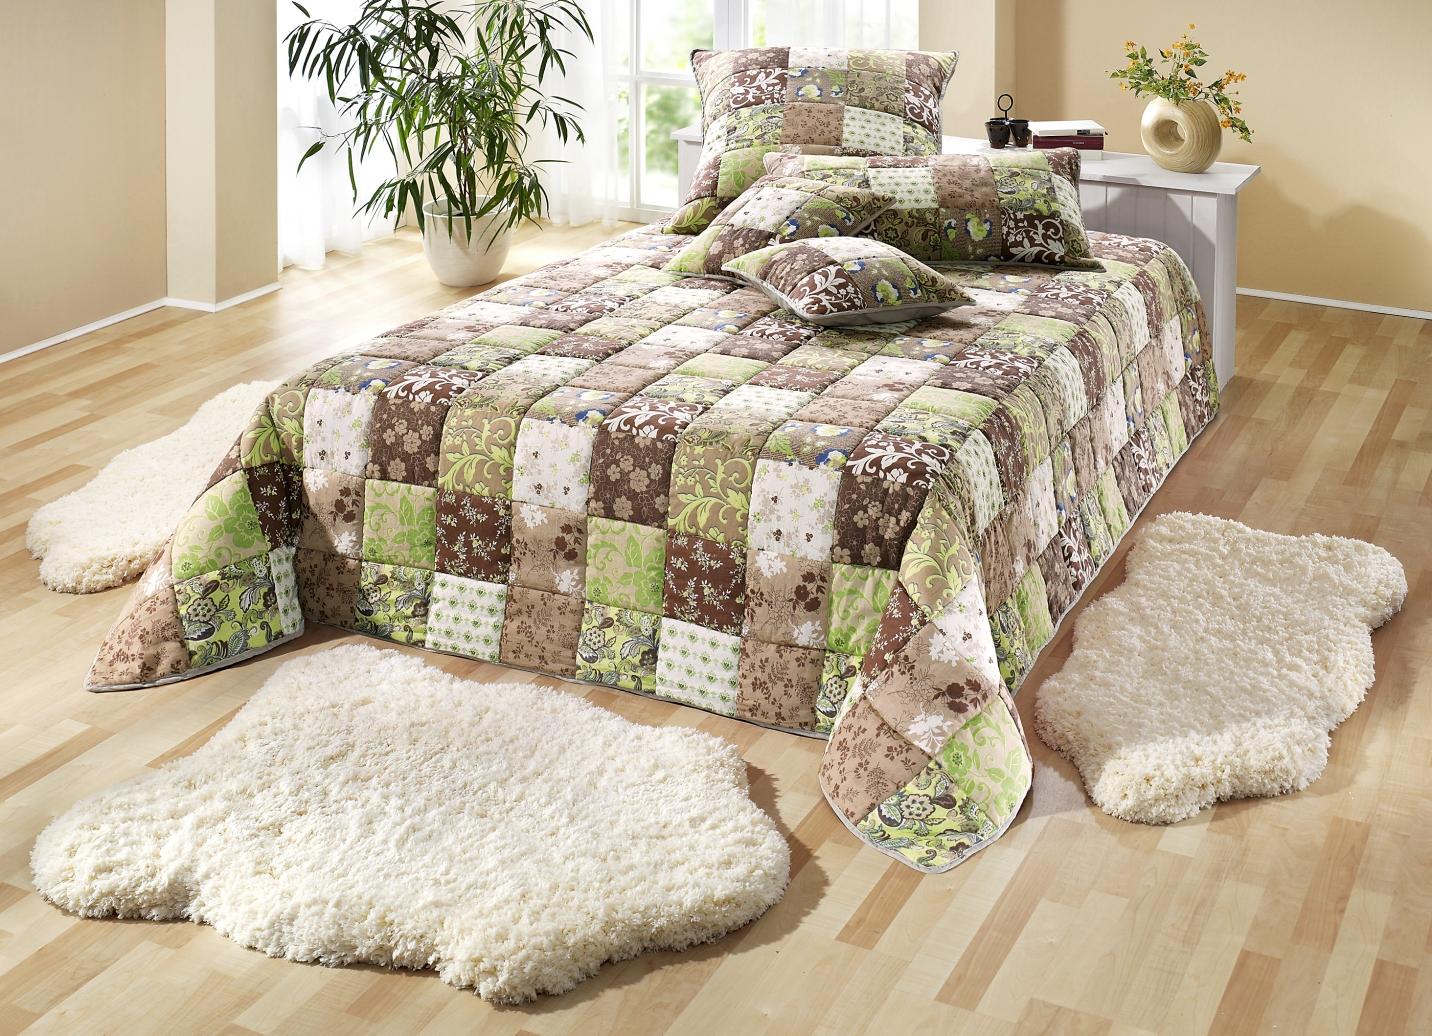 dreams tagesdecke in patchwork optik verschiedene. Black Bedroom Furniture Sets. Home Design Ideas